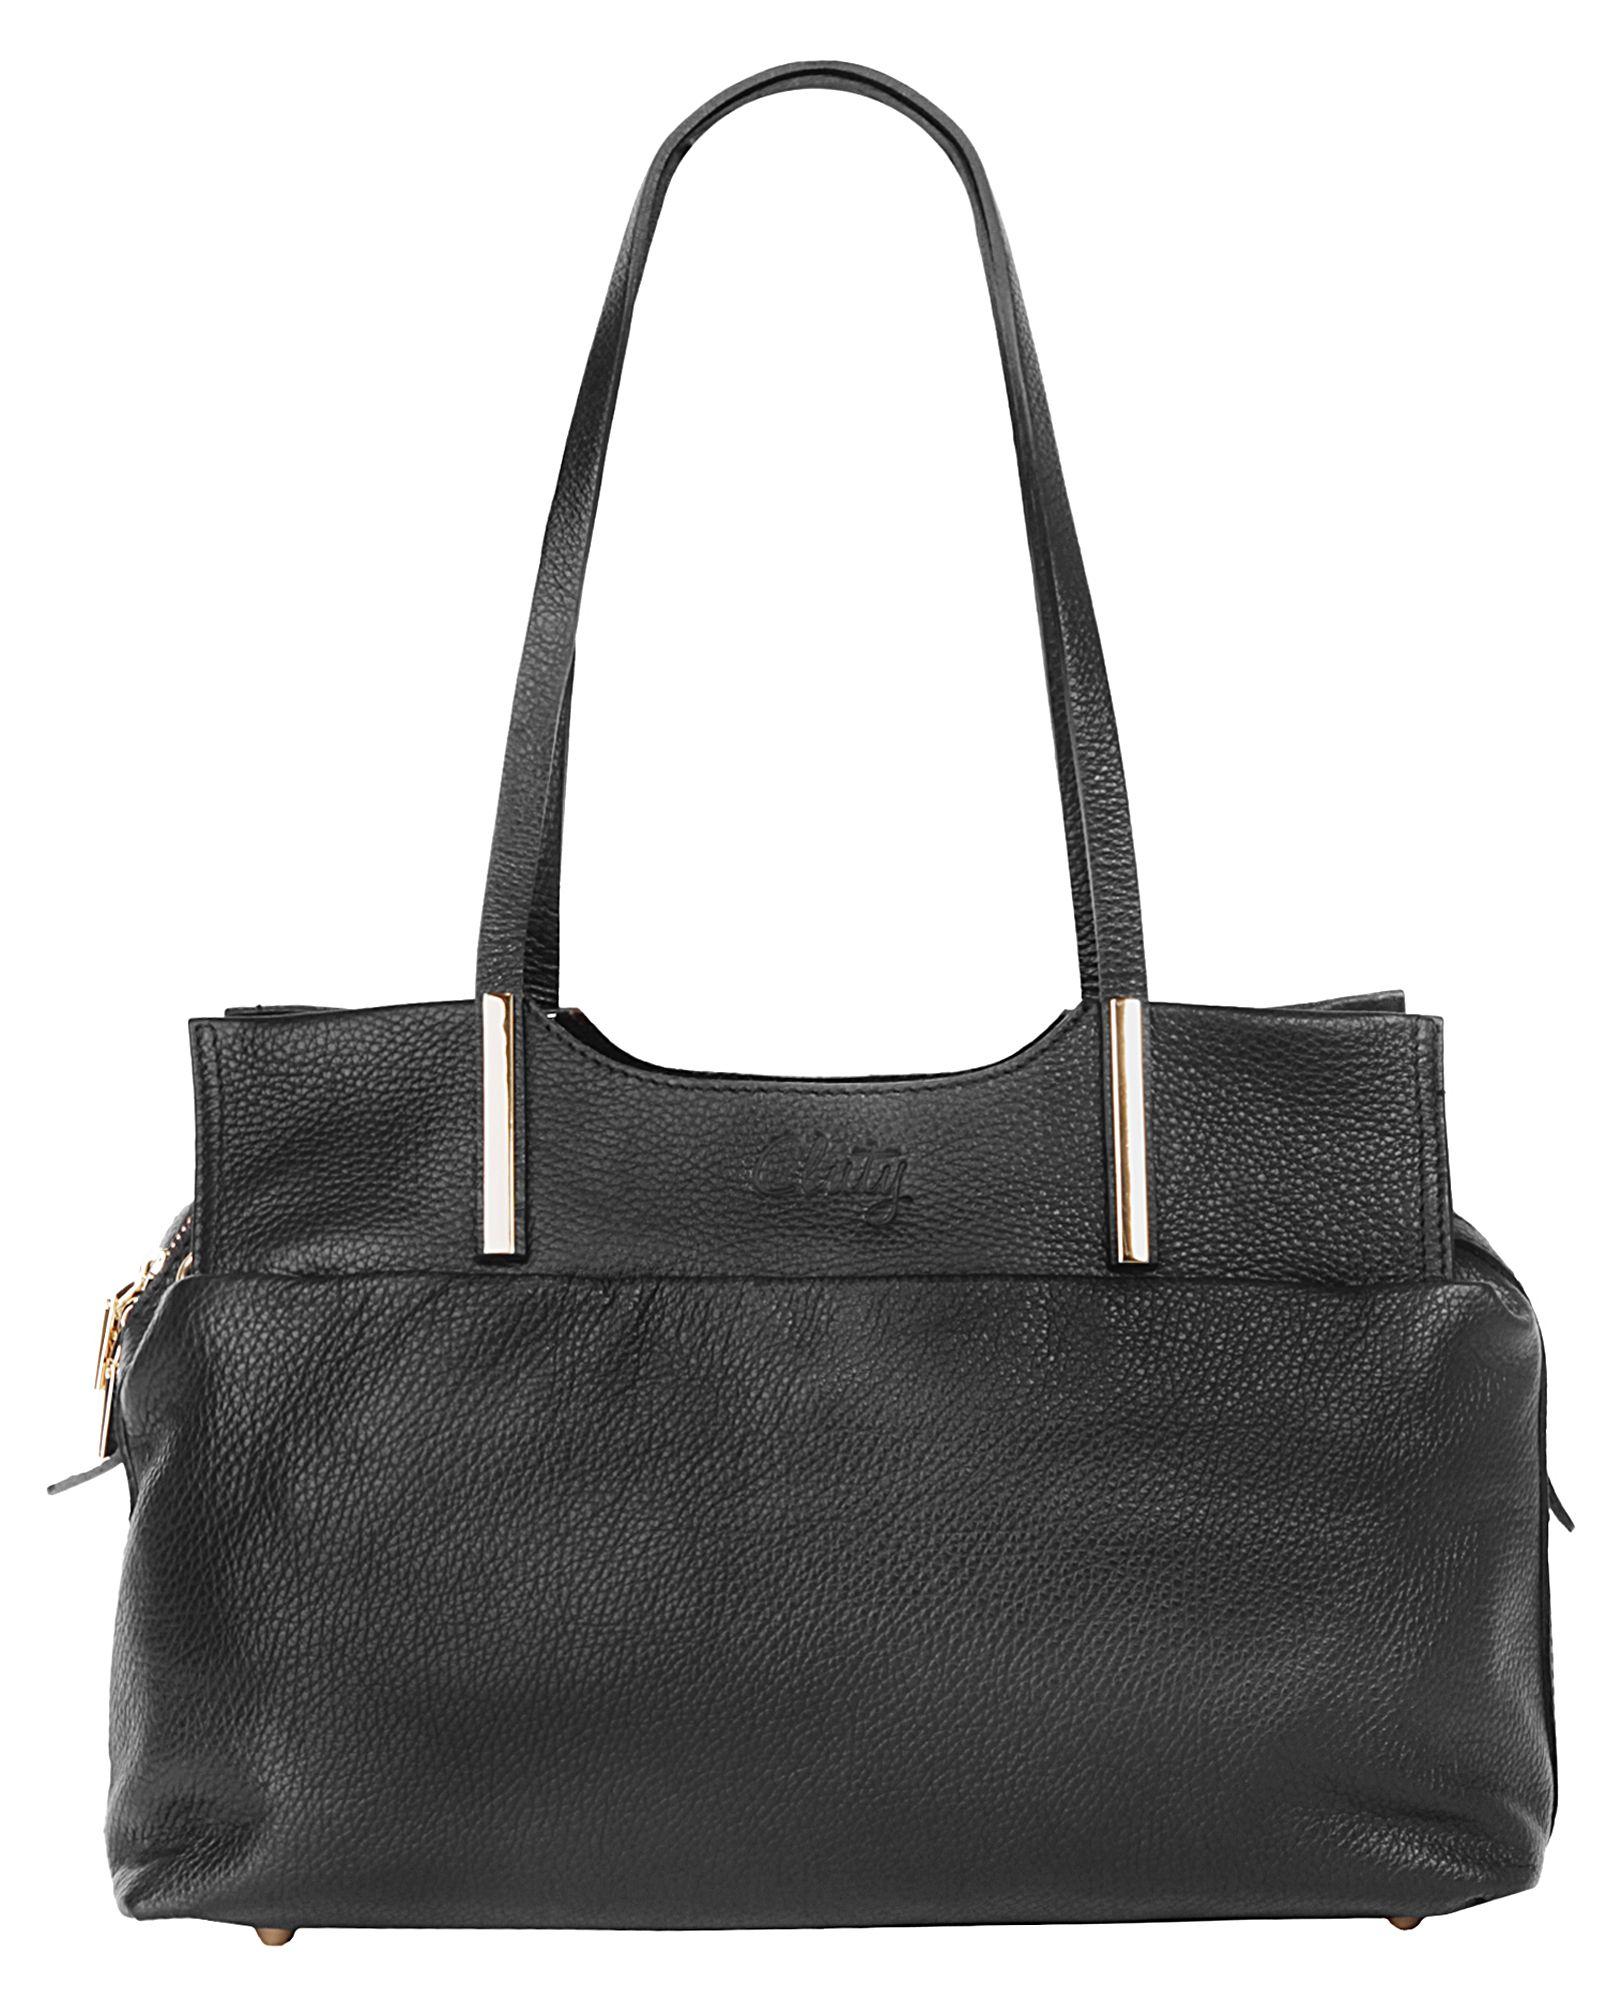 CLUTY Cluty Leder Damen Handtasche mit goldfarbenen Beschlägen